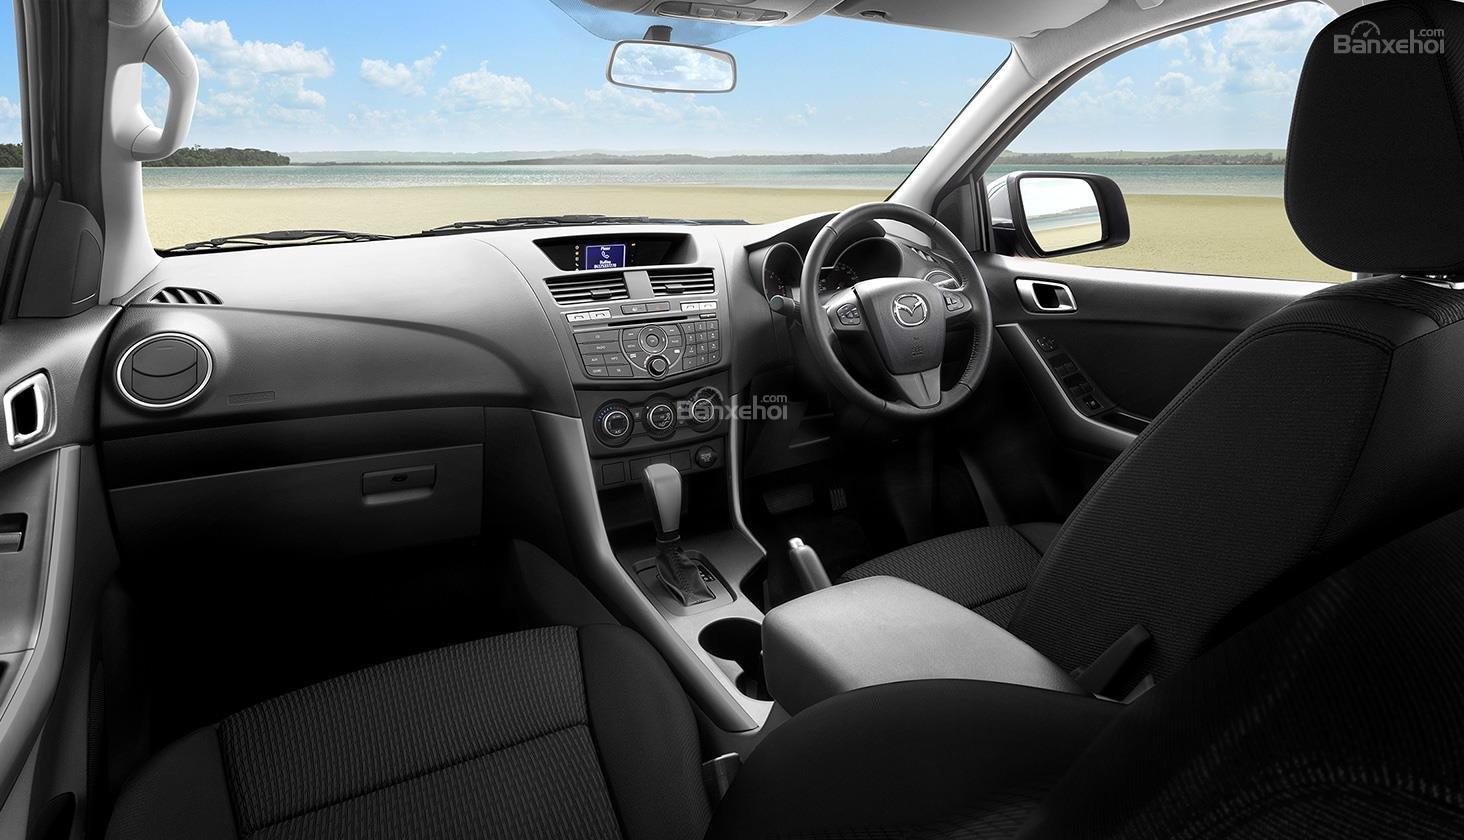 [Mazda Bình Triệu] BT-50 2.2 AT 2019, ưu đãi 15 triệu tiền mặt (6)